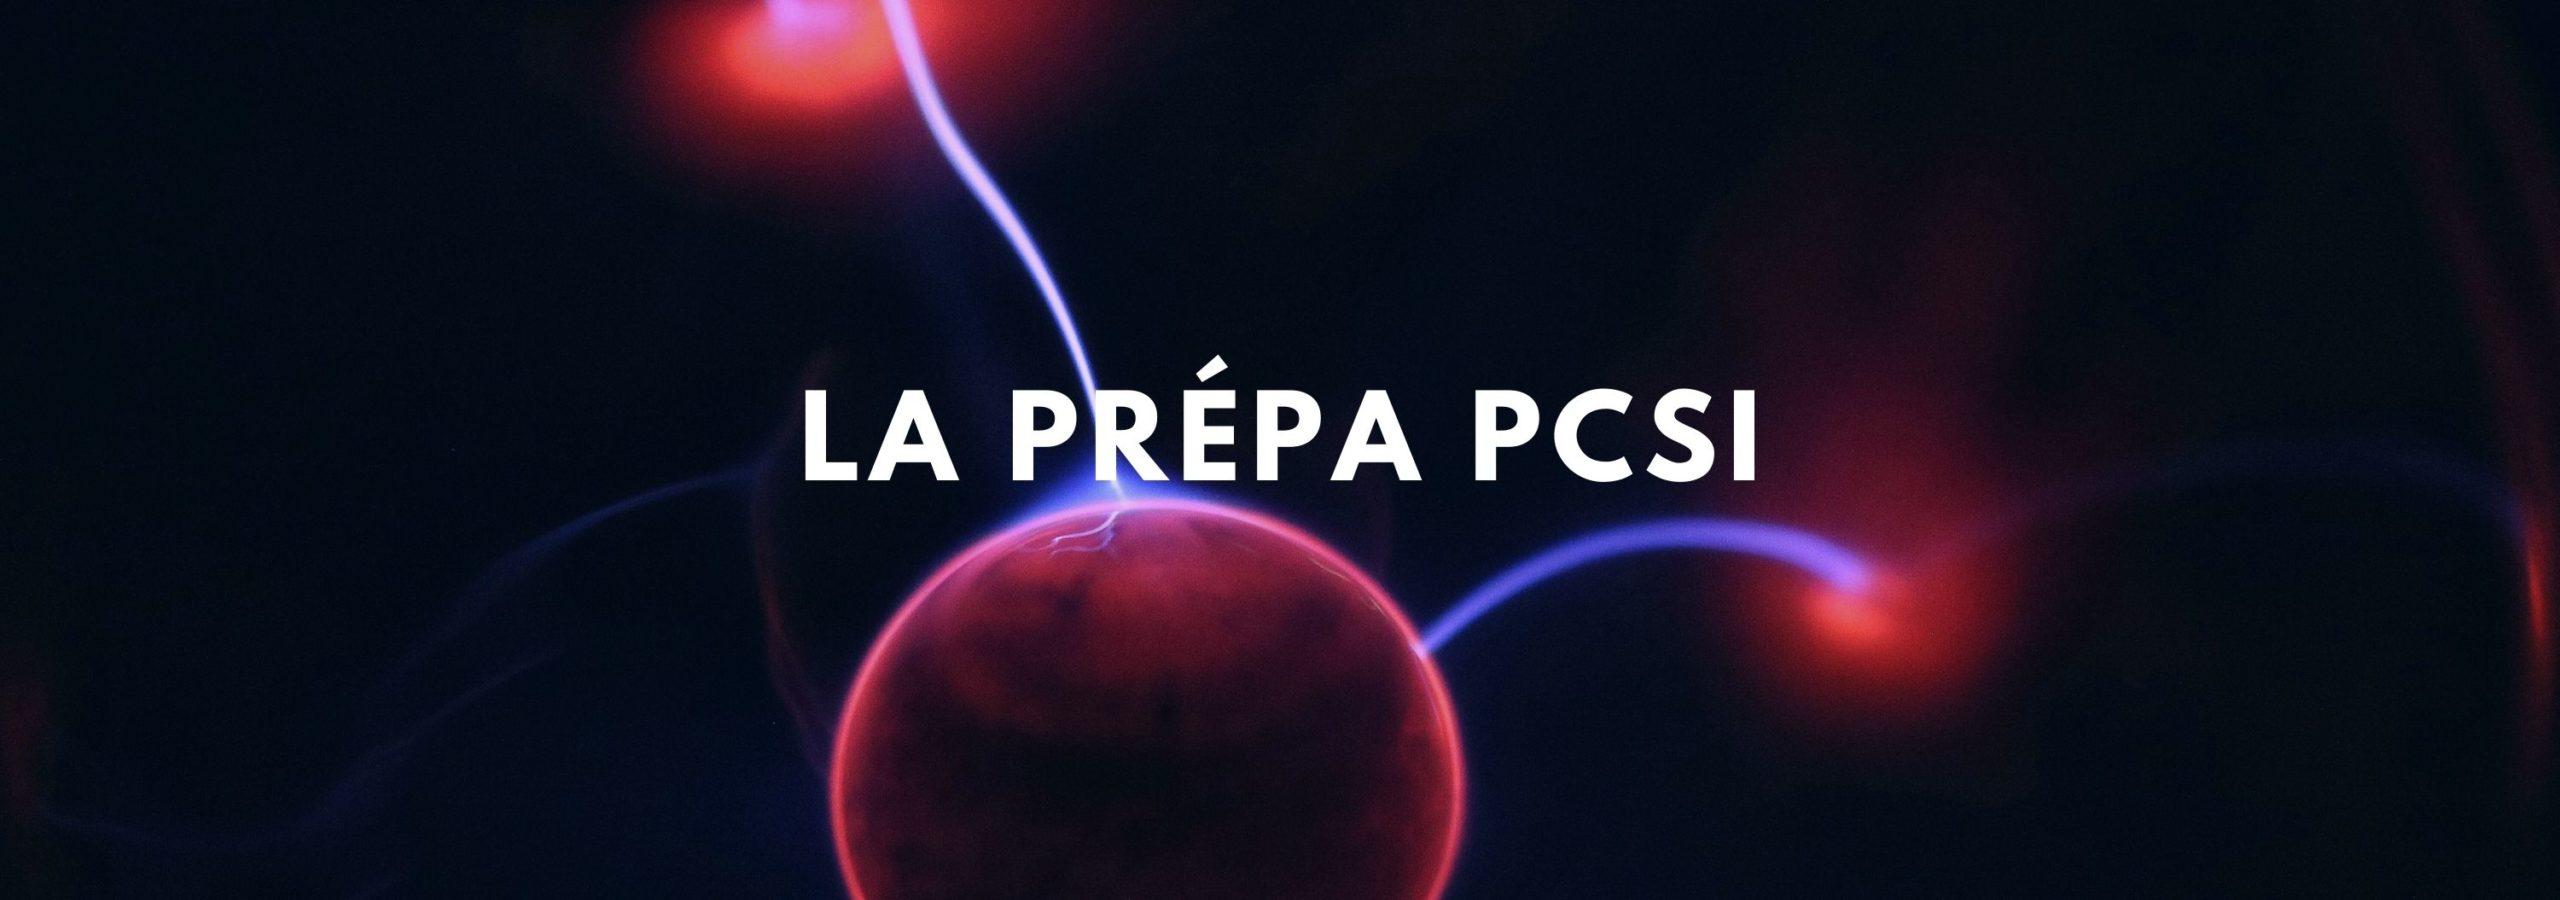 Prepa PCSI